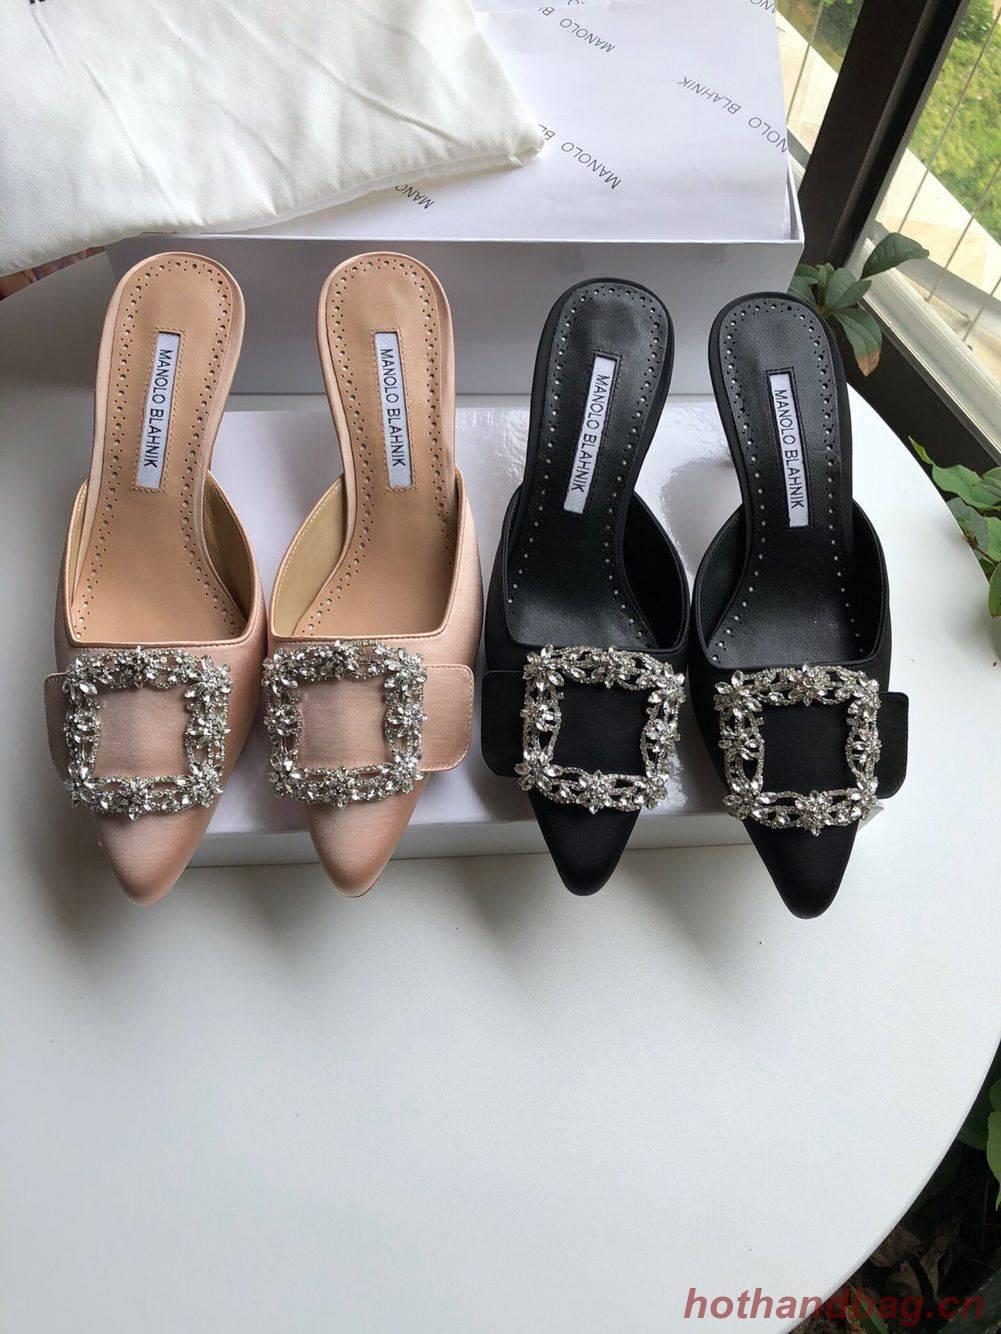 Manolo Blahnik Shoes MB3689